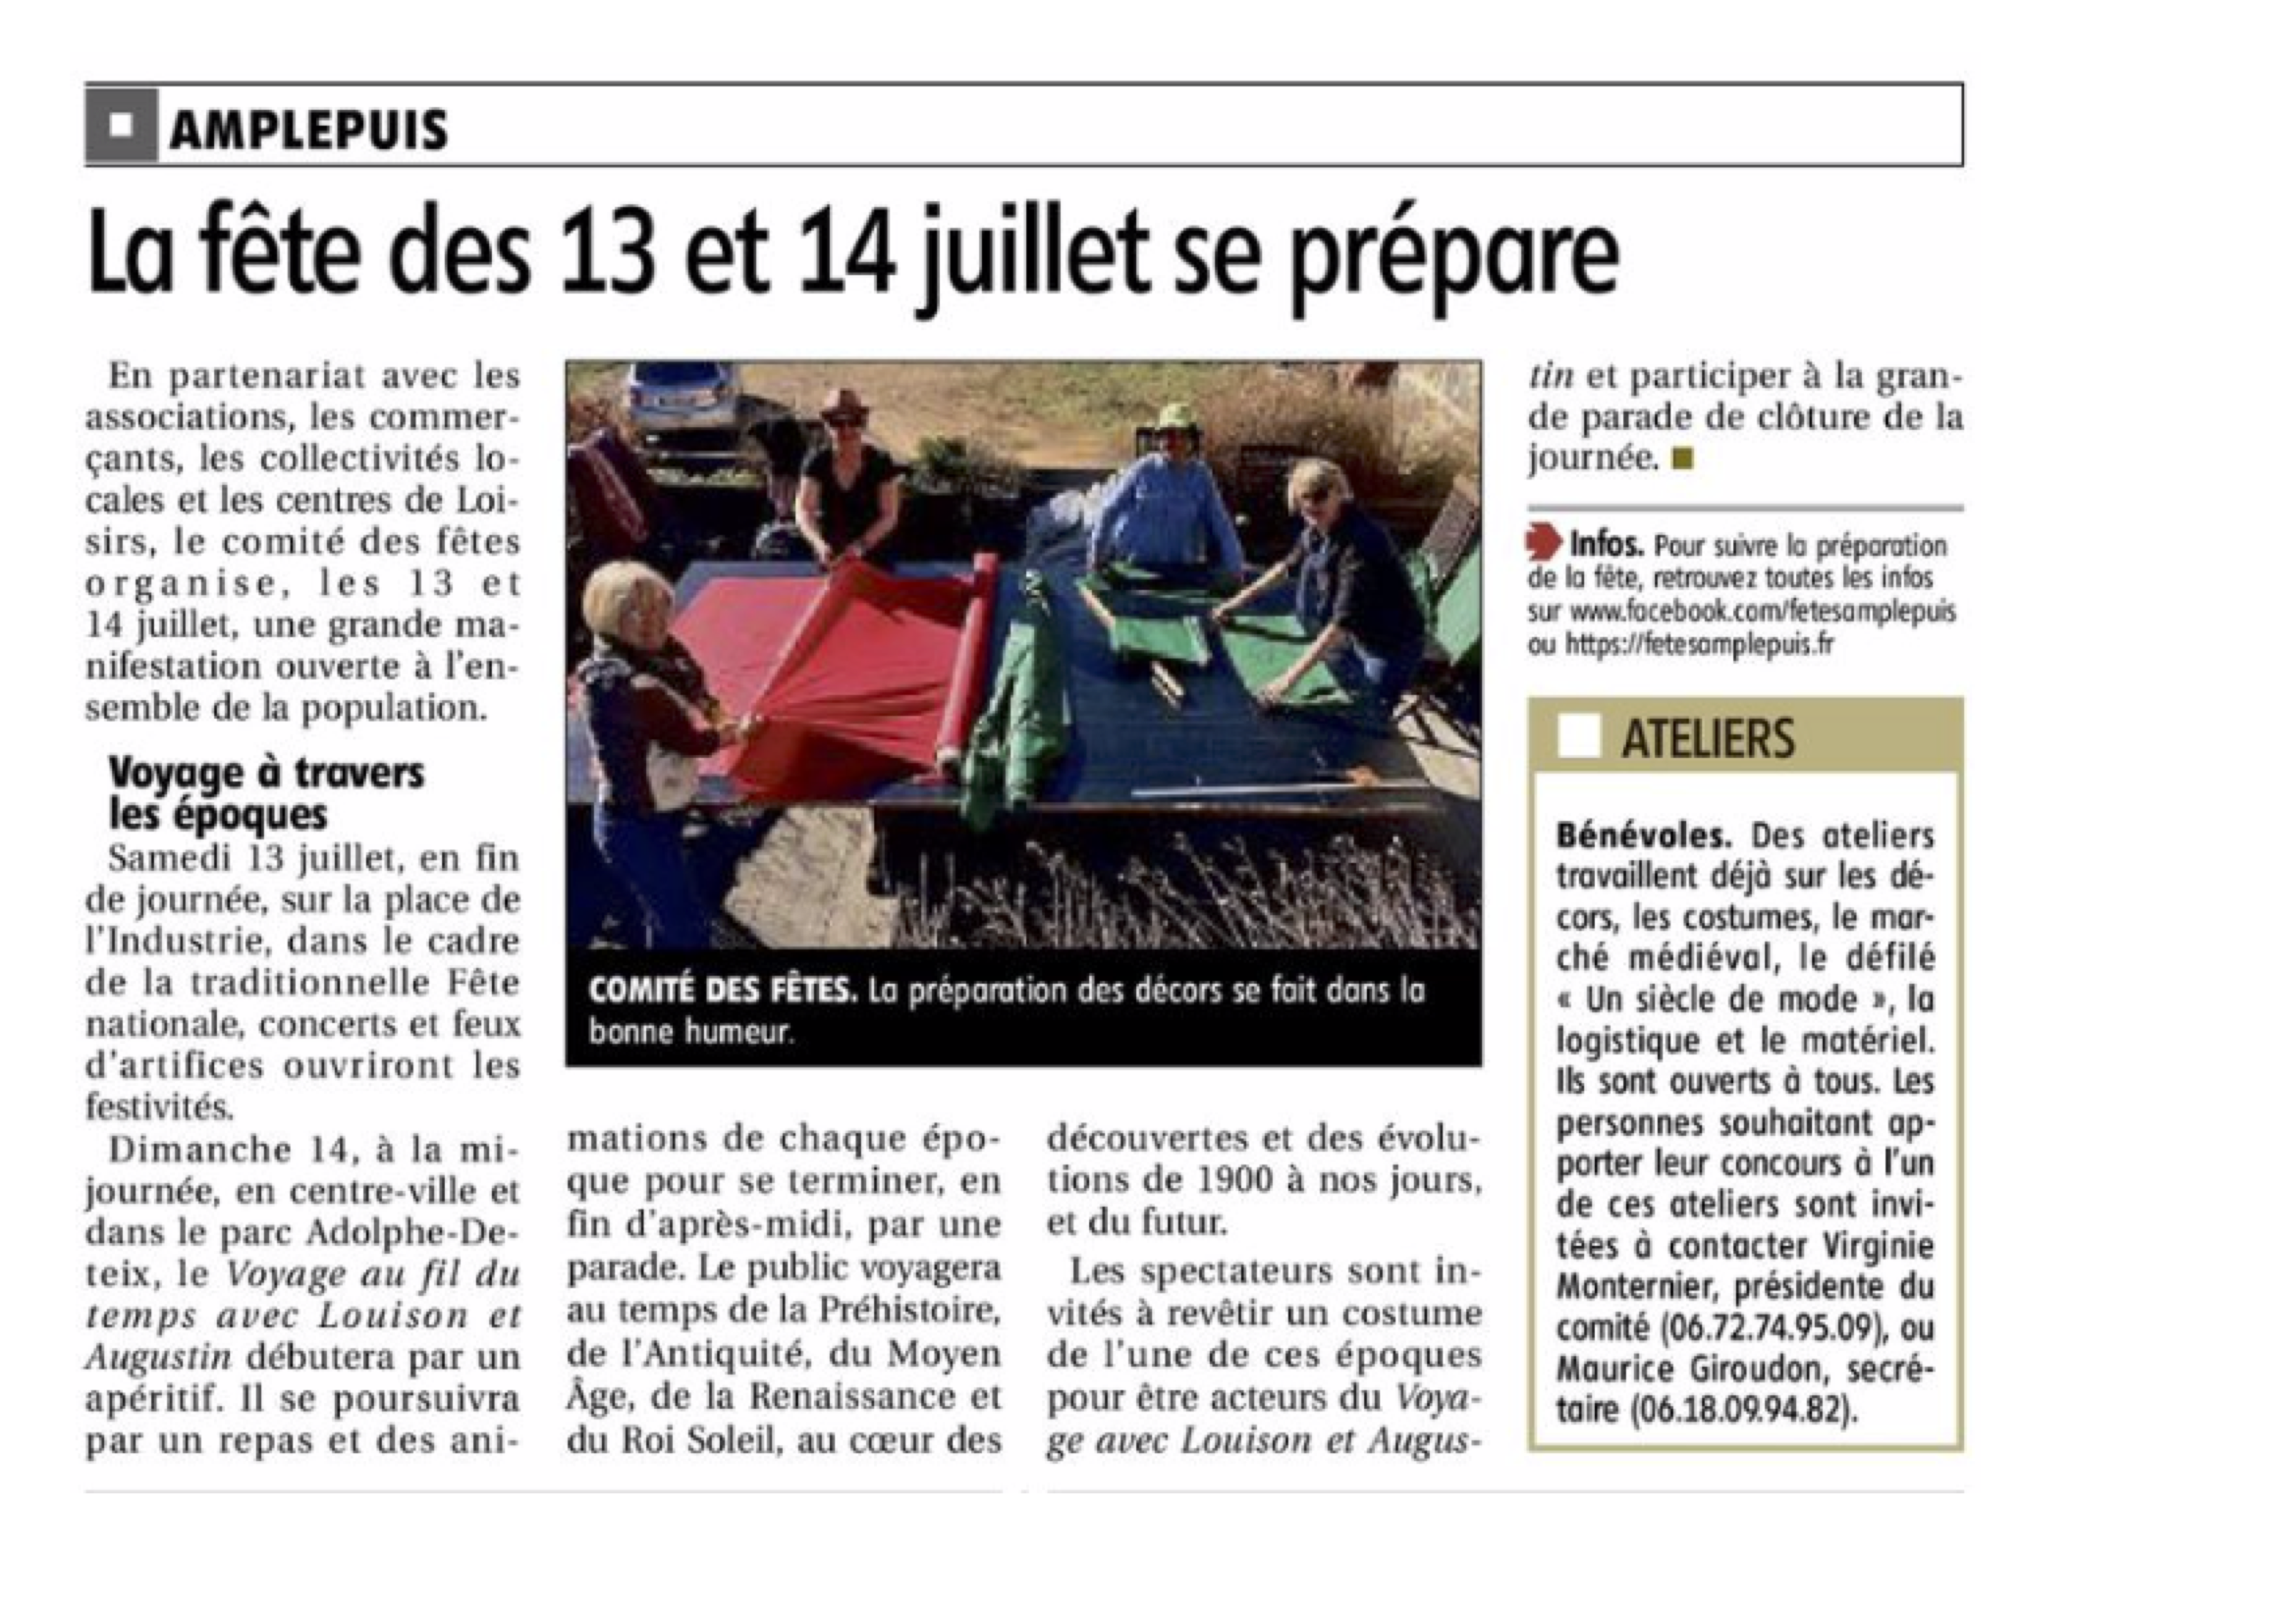 190516_ Article _Amplepuis en Fête_.png